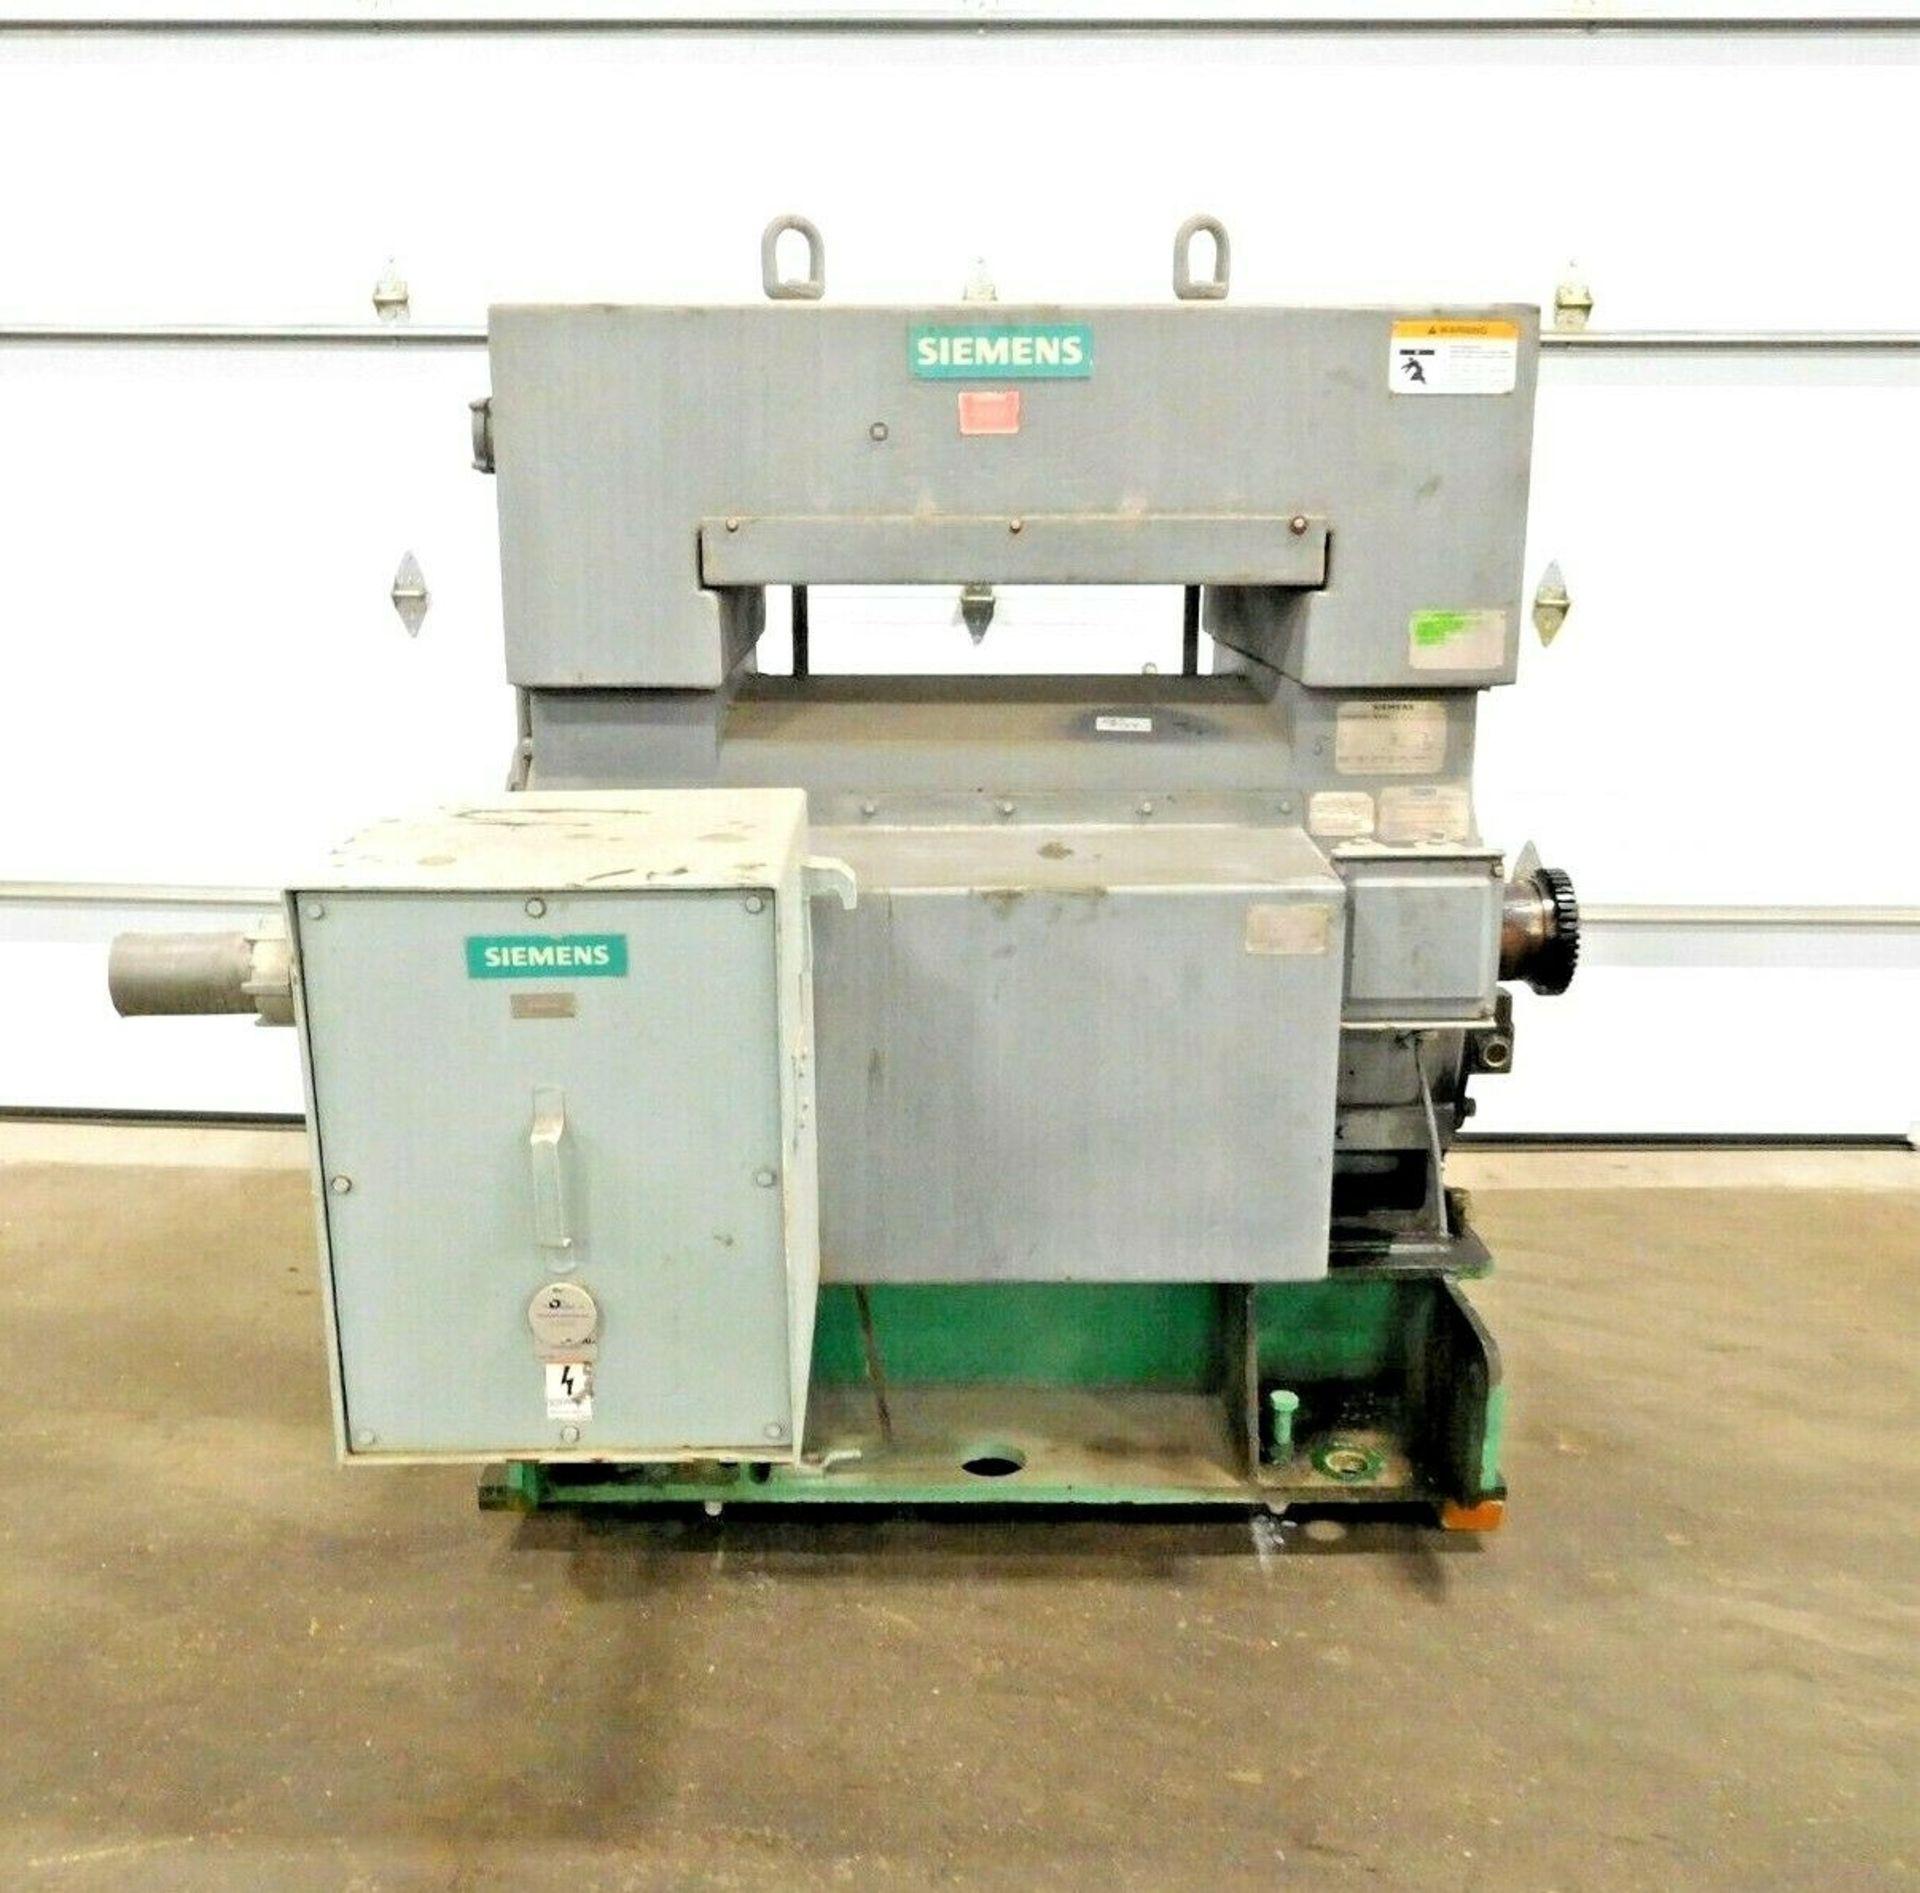 Siemens 1100 HP Electric Motor. 4000 V. 3 Ph. 1783 RPM. CGII. 5810S. 60 Hz.